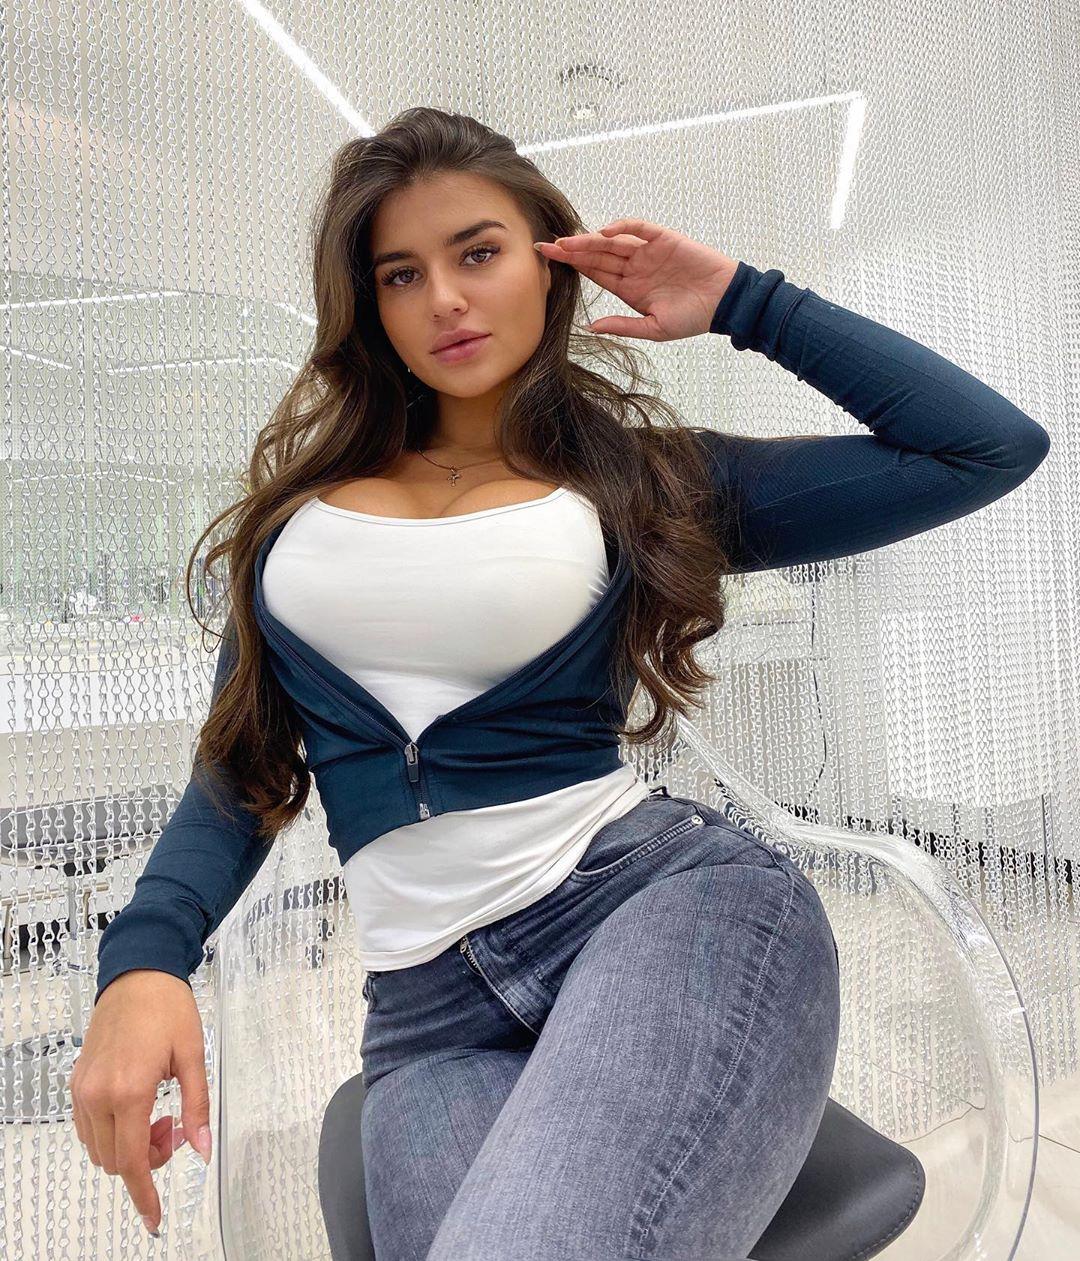 Valeriya-Bearwolf-Wallpapers-Insta-Fit-Bio-9